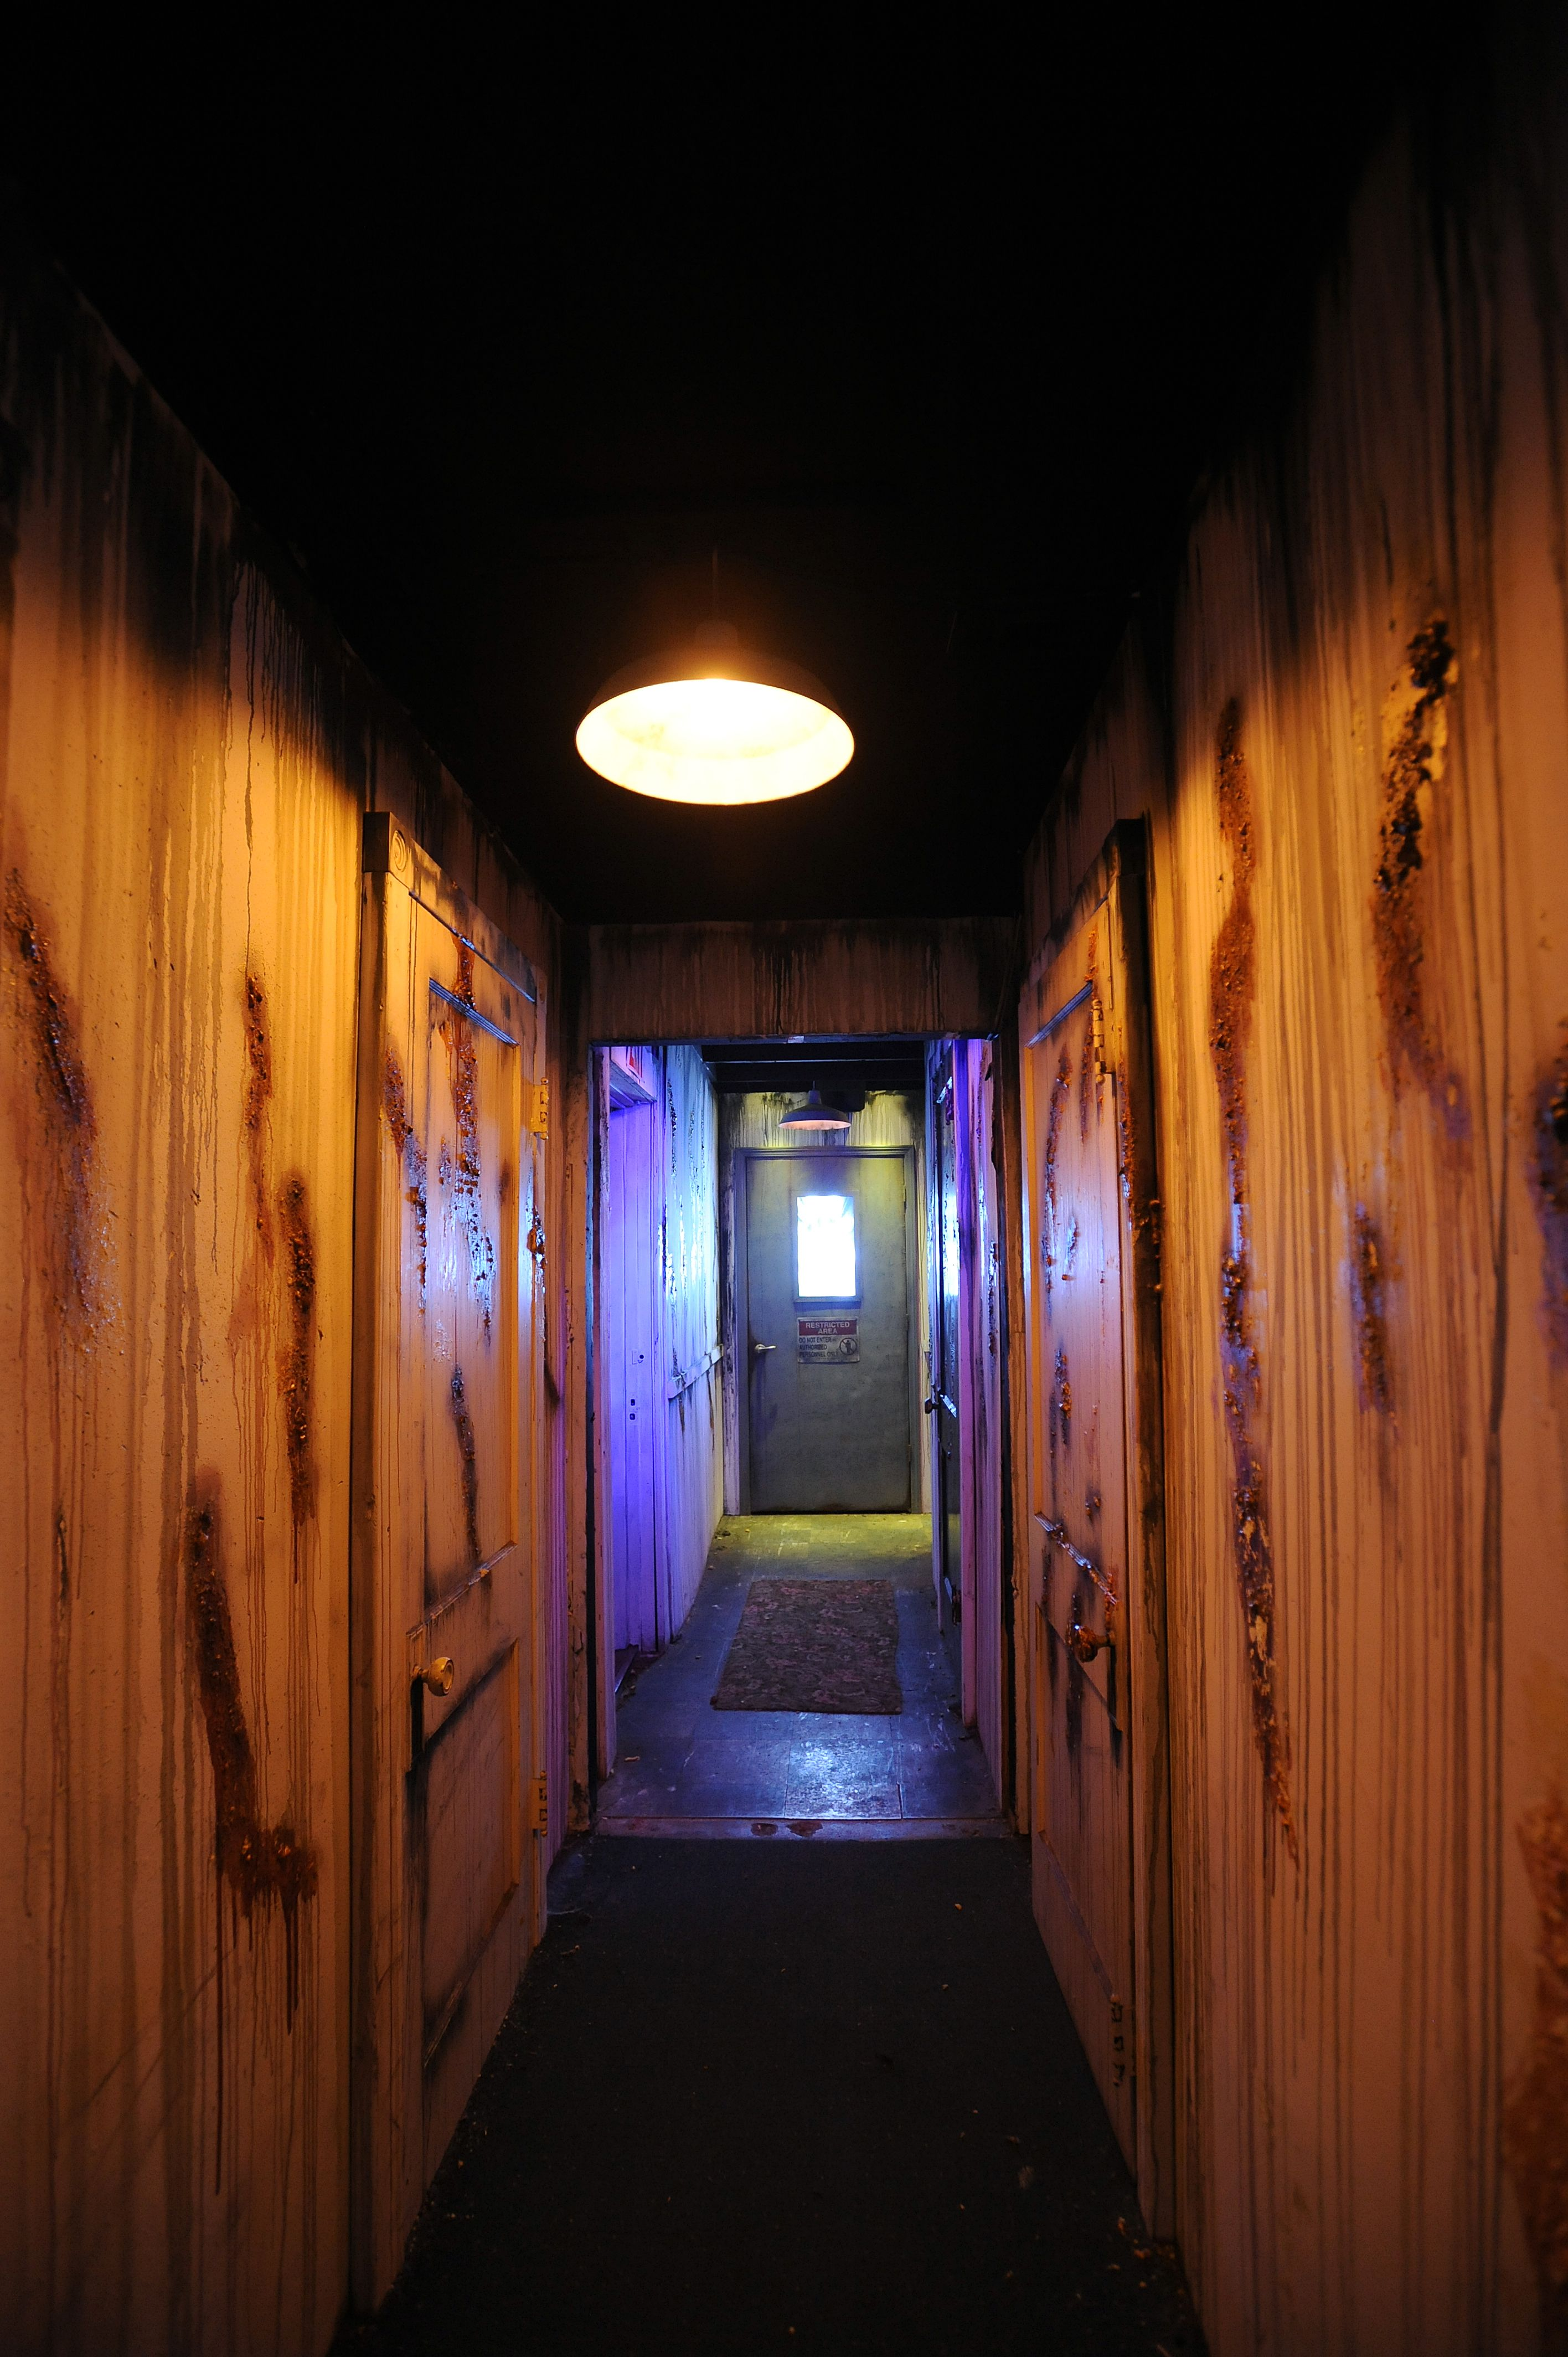 Uncategorized Garage Haunted House raycliff manor asylum halls www raycliffmanor com halloween garage haunted